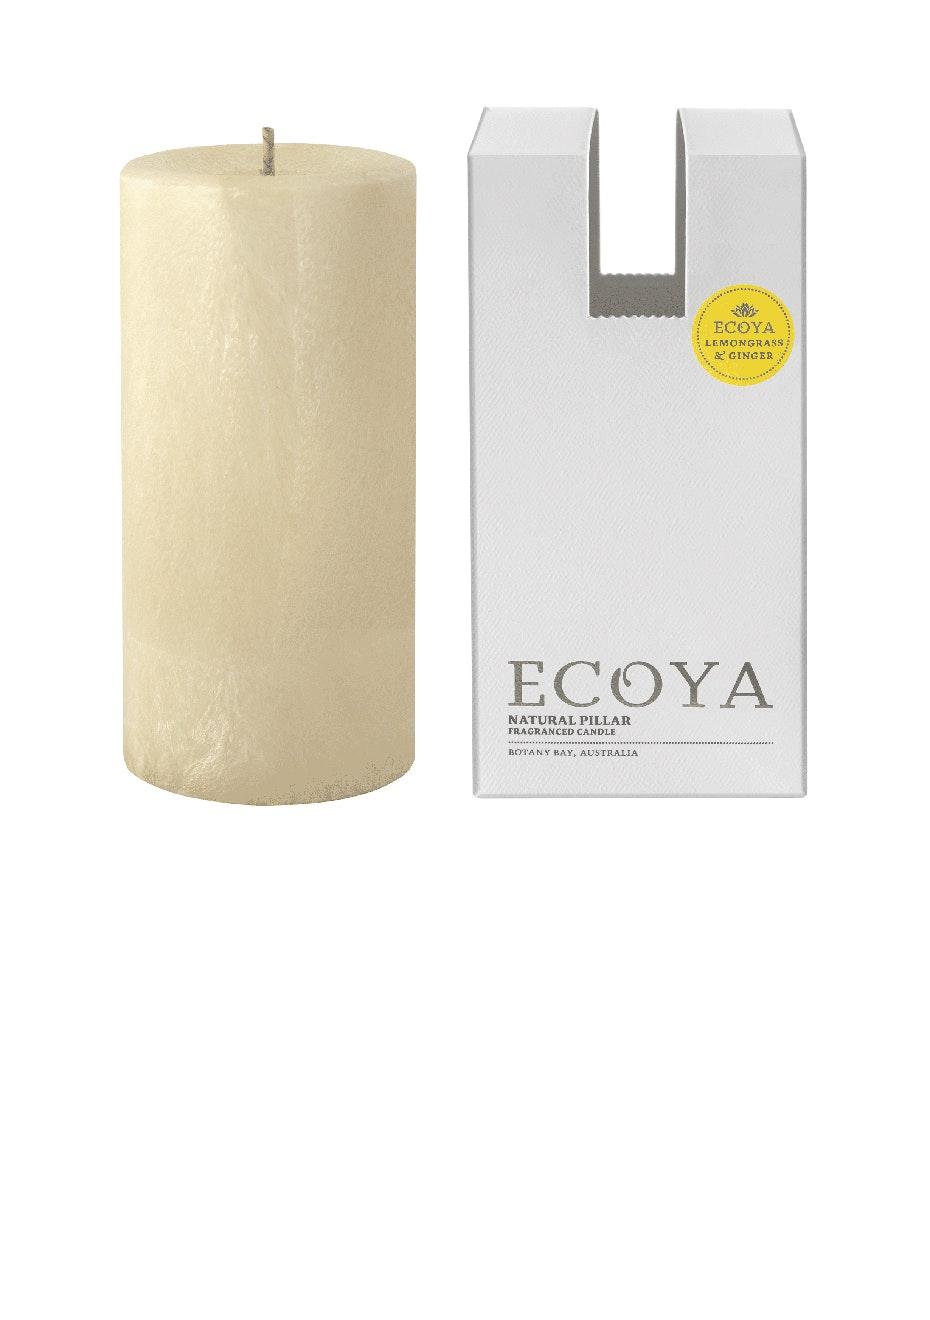 Ecoya - Pillar 75x155 Natural -Lemongrass & Ginger